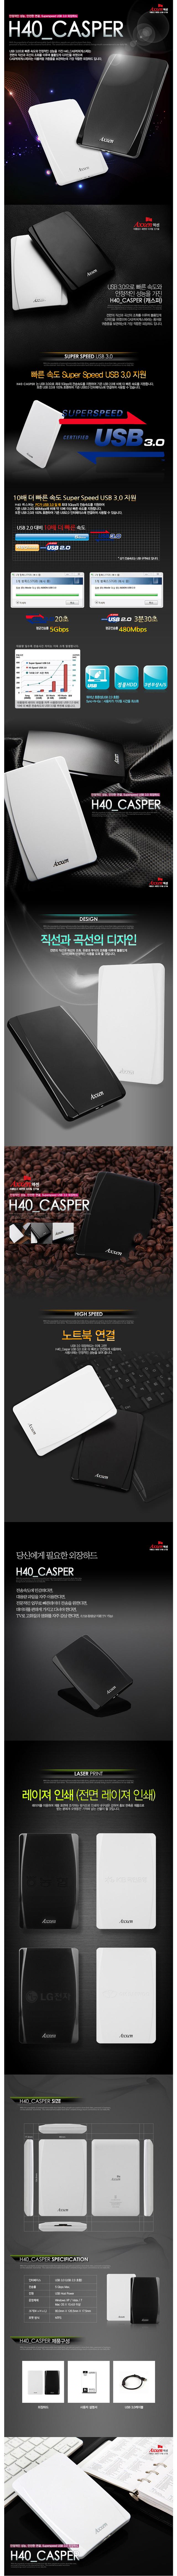 h40 캐스퍼_640.jpg